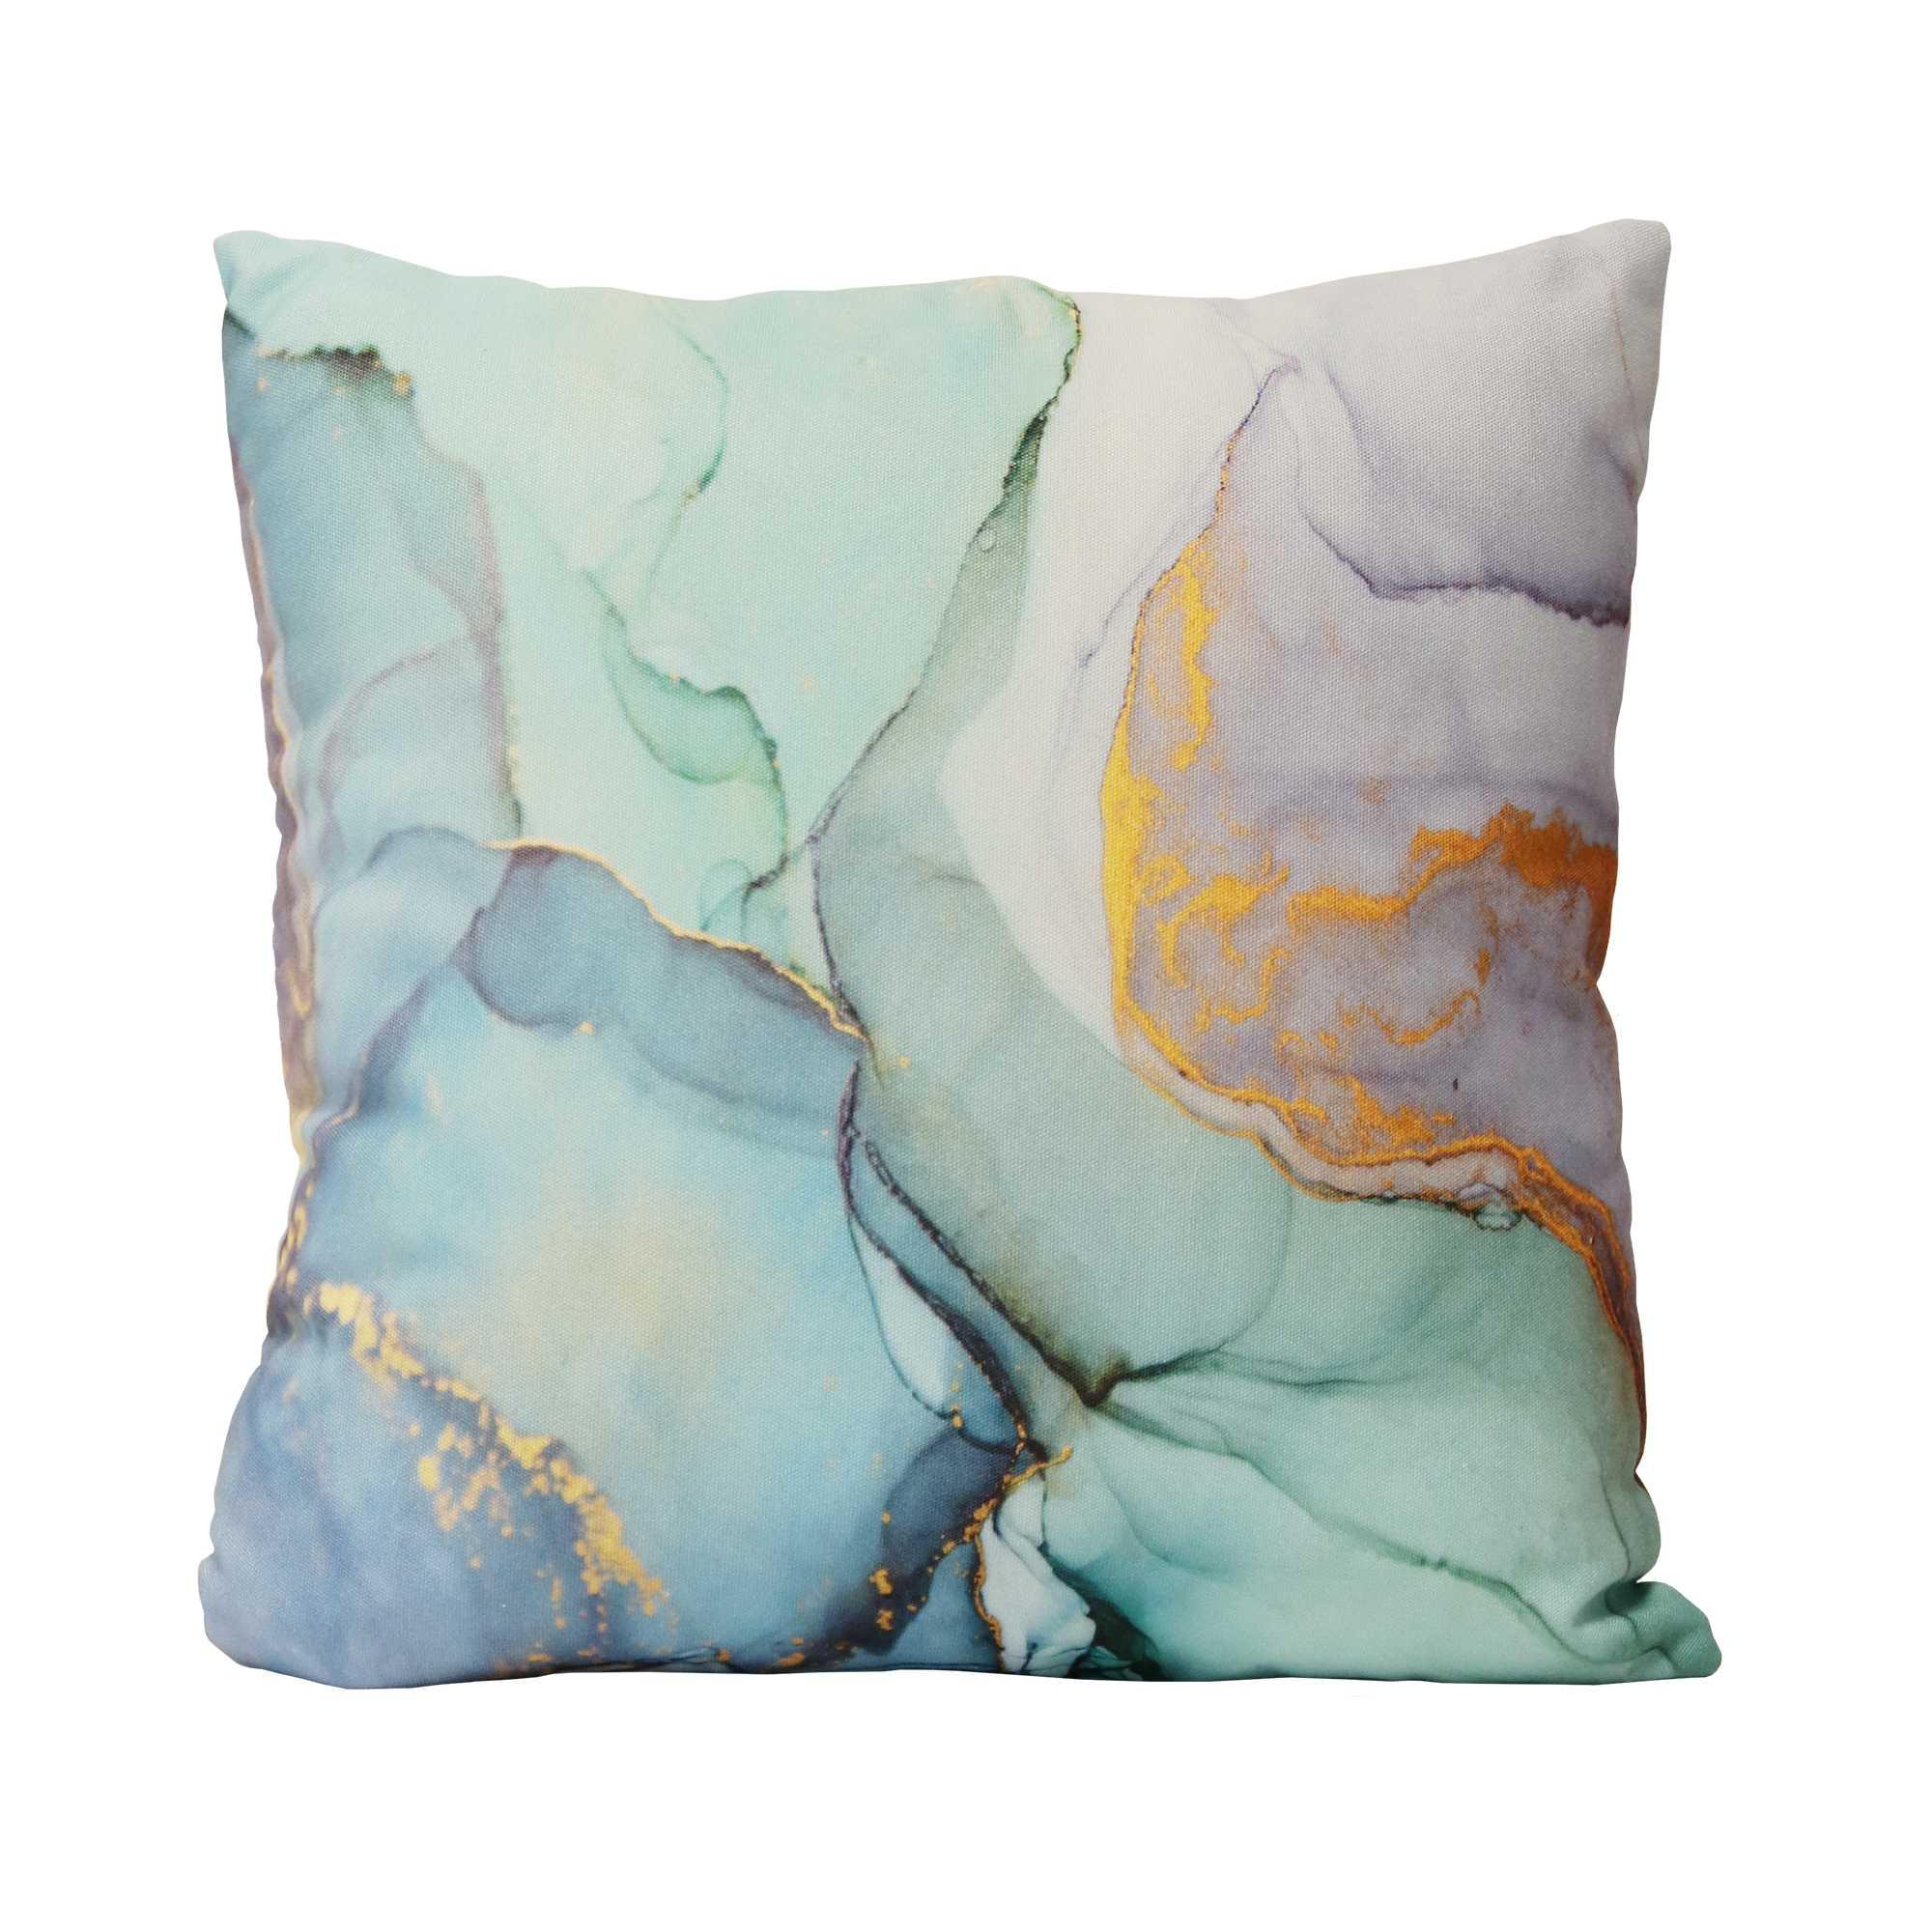 Pastel Watercolor Marble Cotton Square Pillow